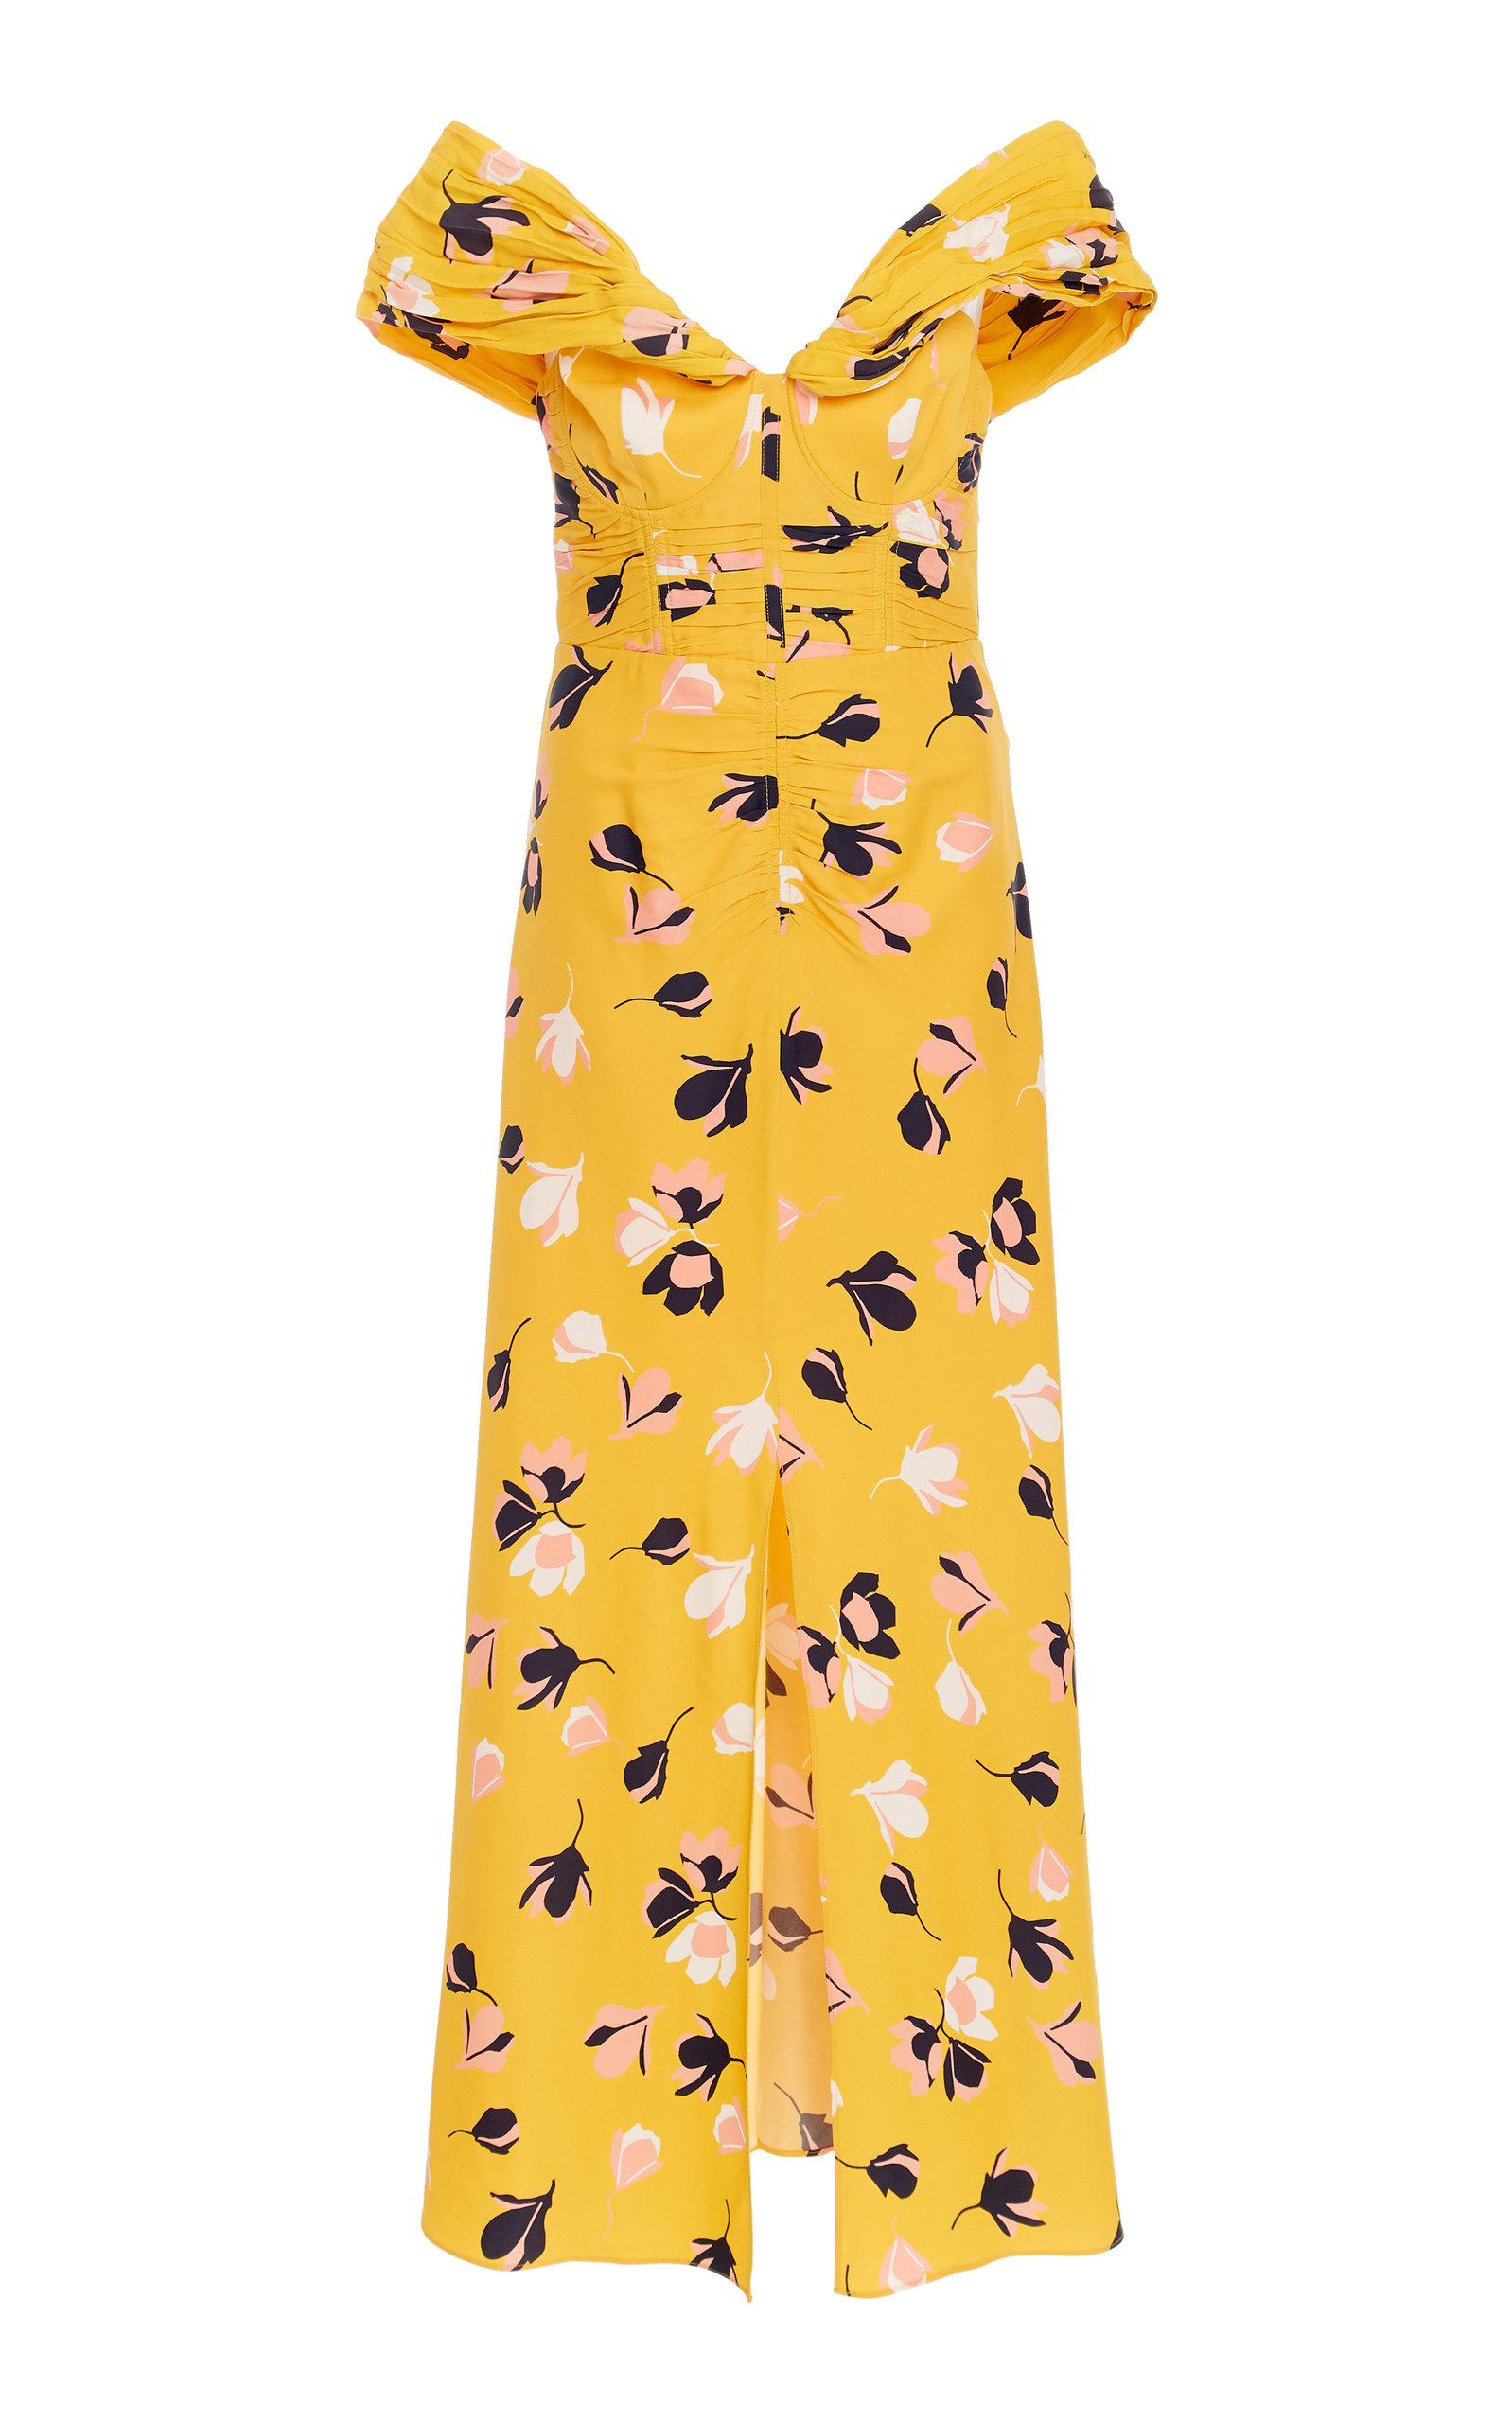 b61870645af5 Self PortraitExclusive Floral-Print Jersey Midi Dress. CLOSE. Loading